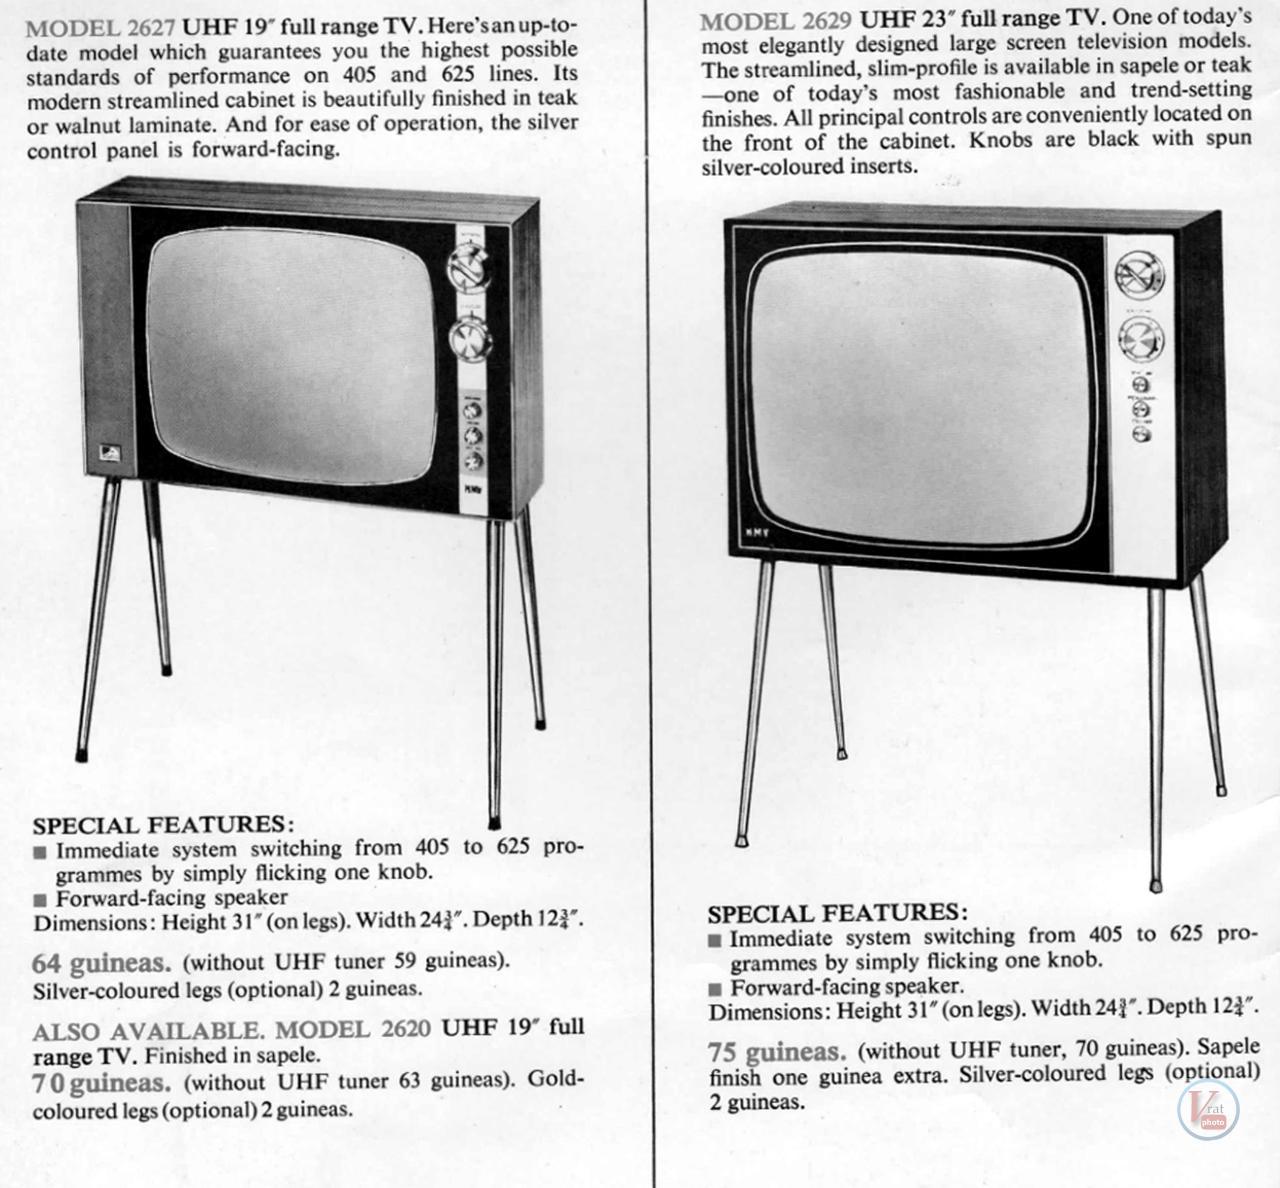 HMV B&W TV's 72